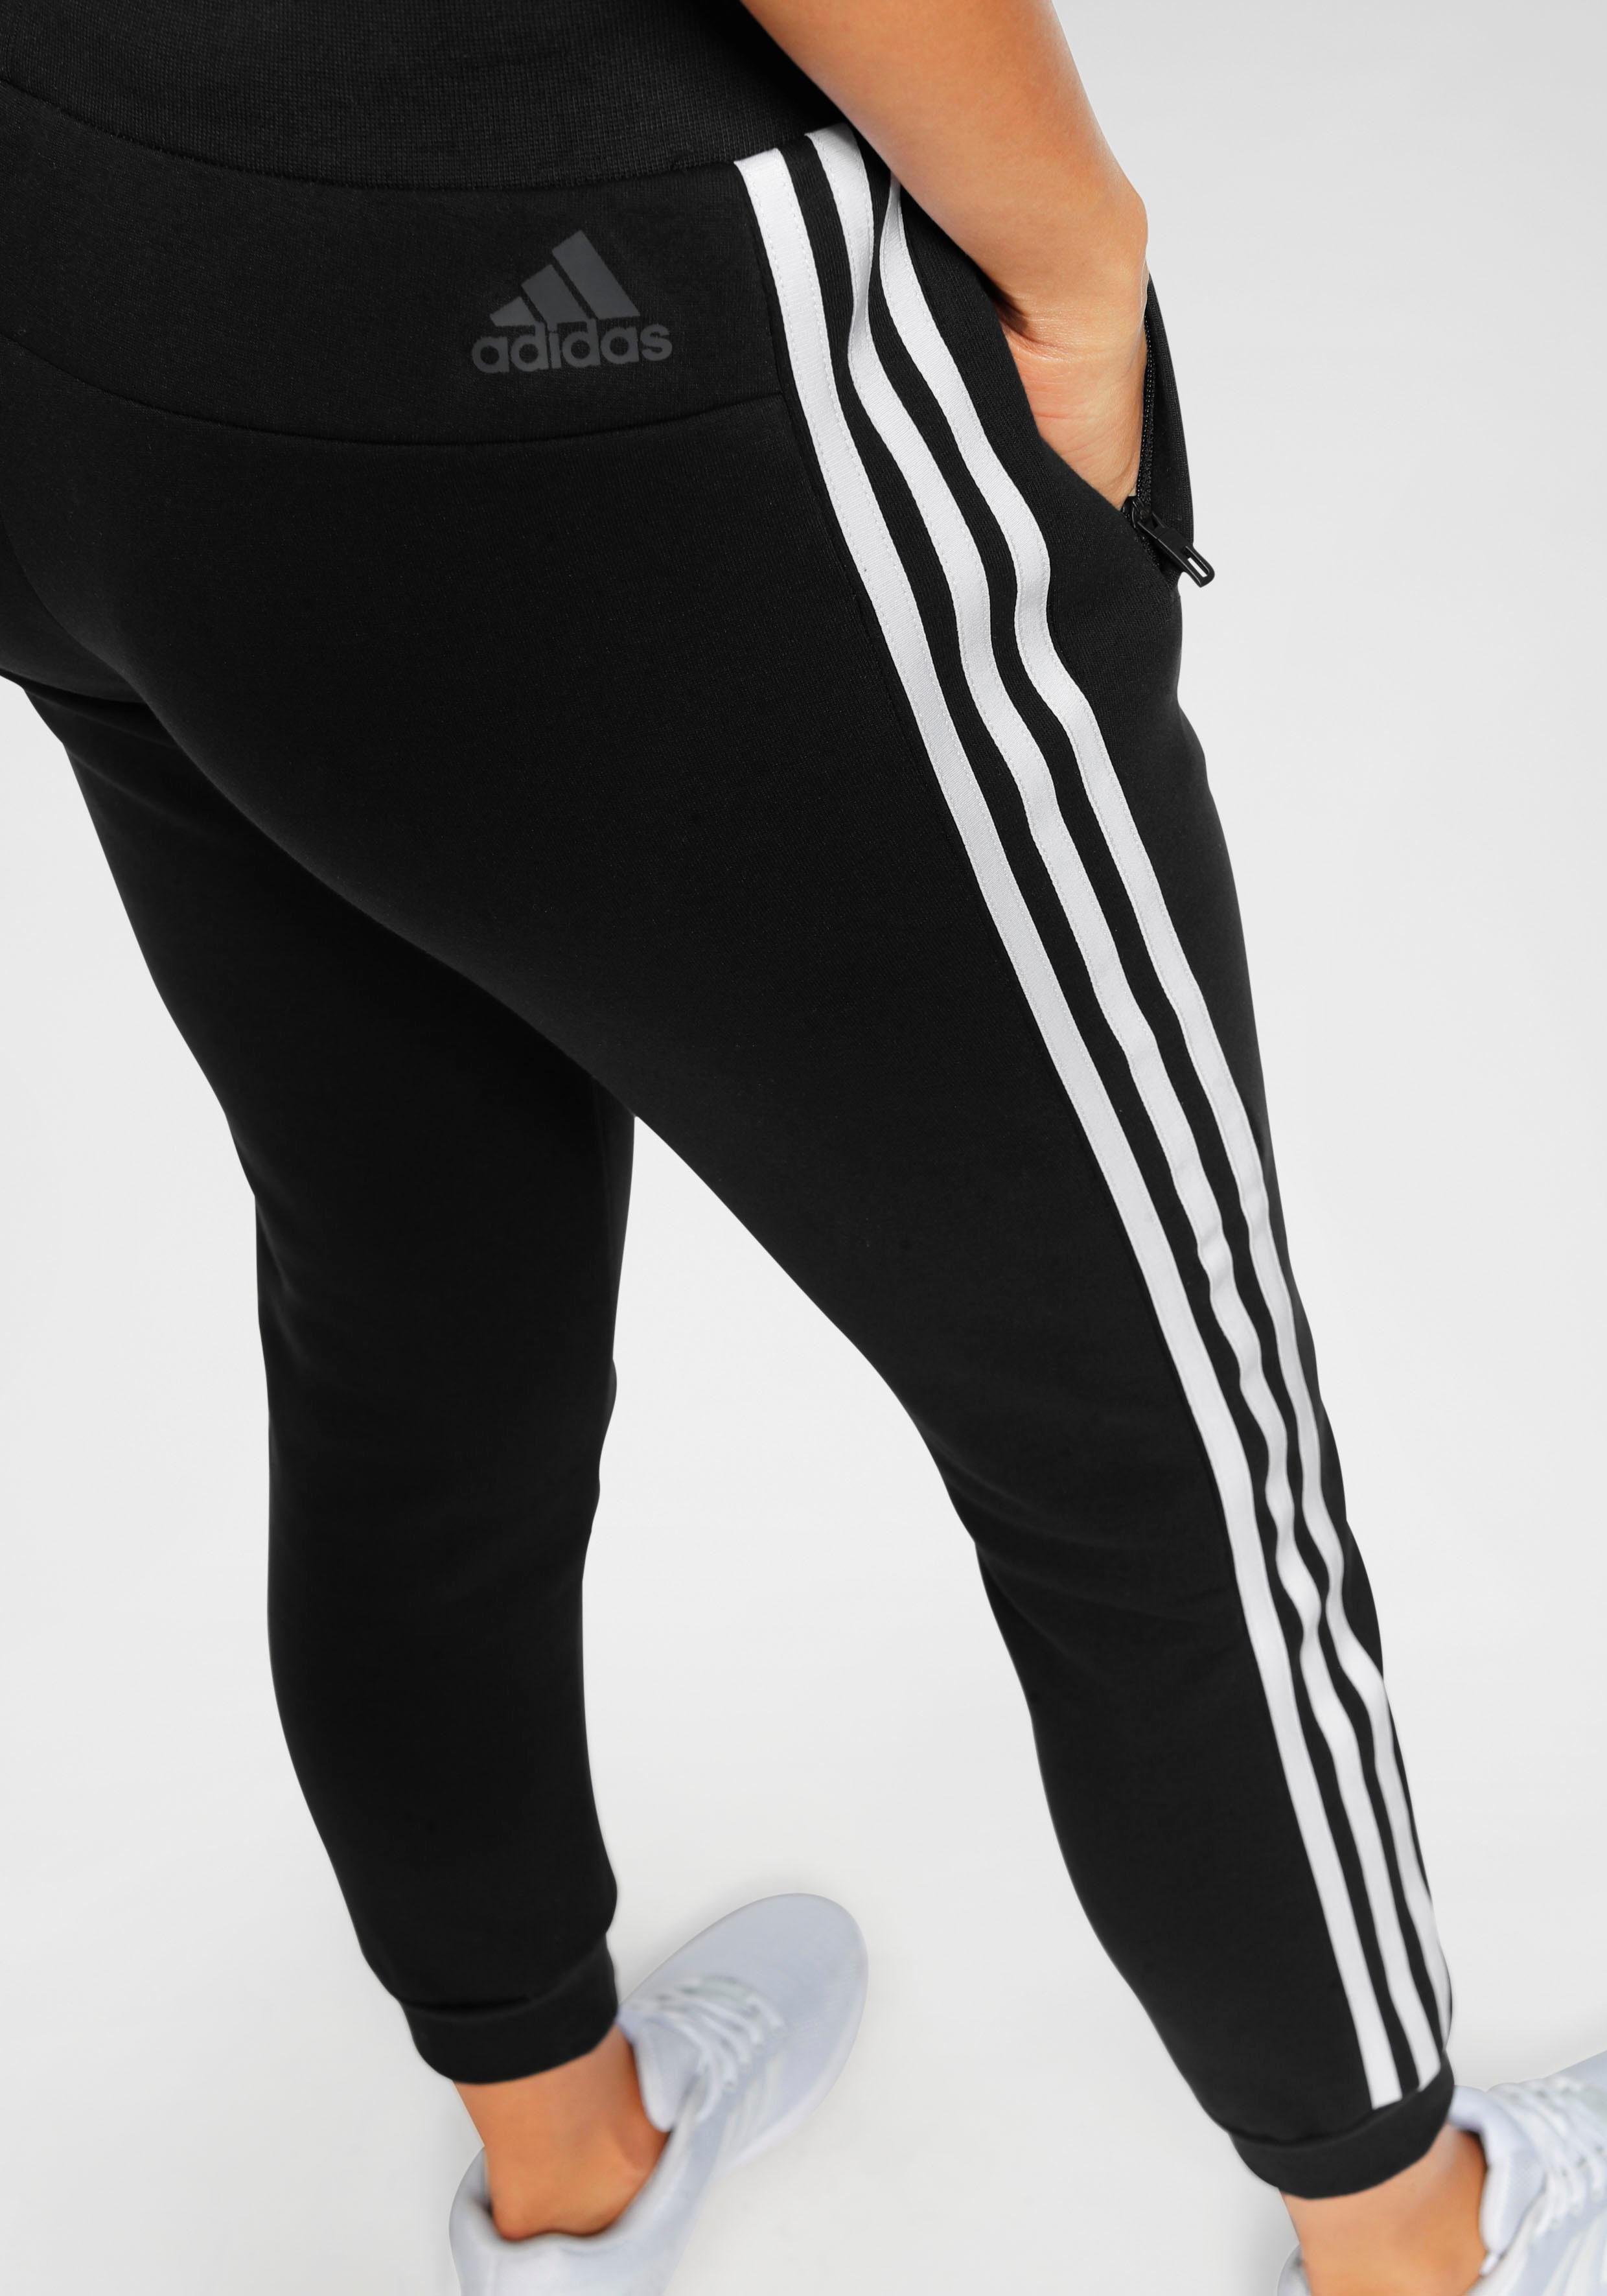 adidas Performance joggingbroek »MH PANT DK 3 STRIPES«